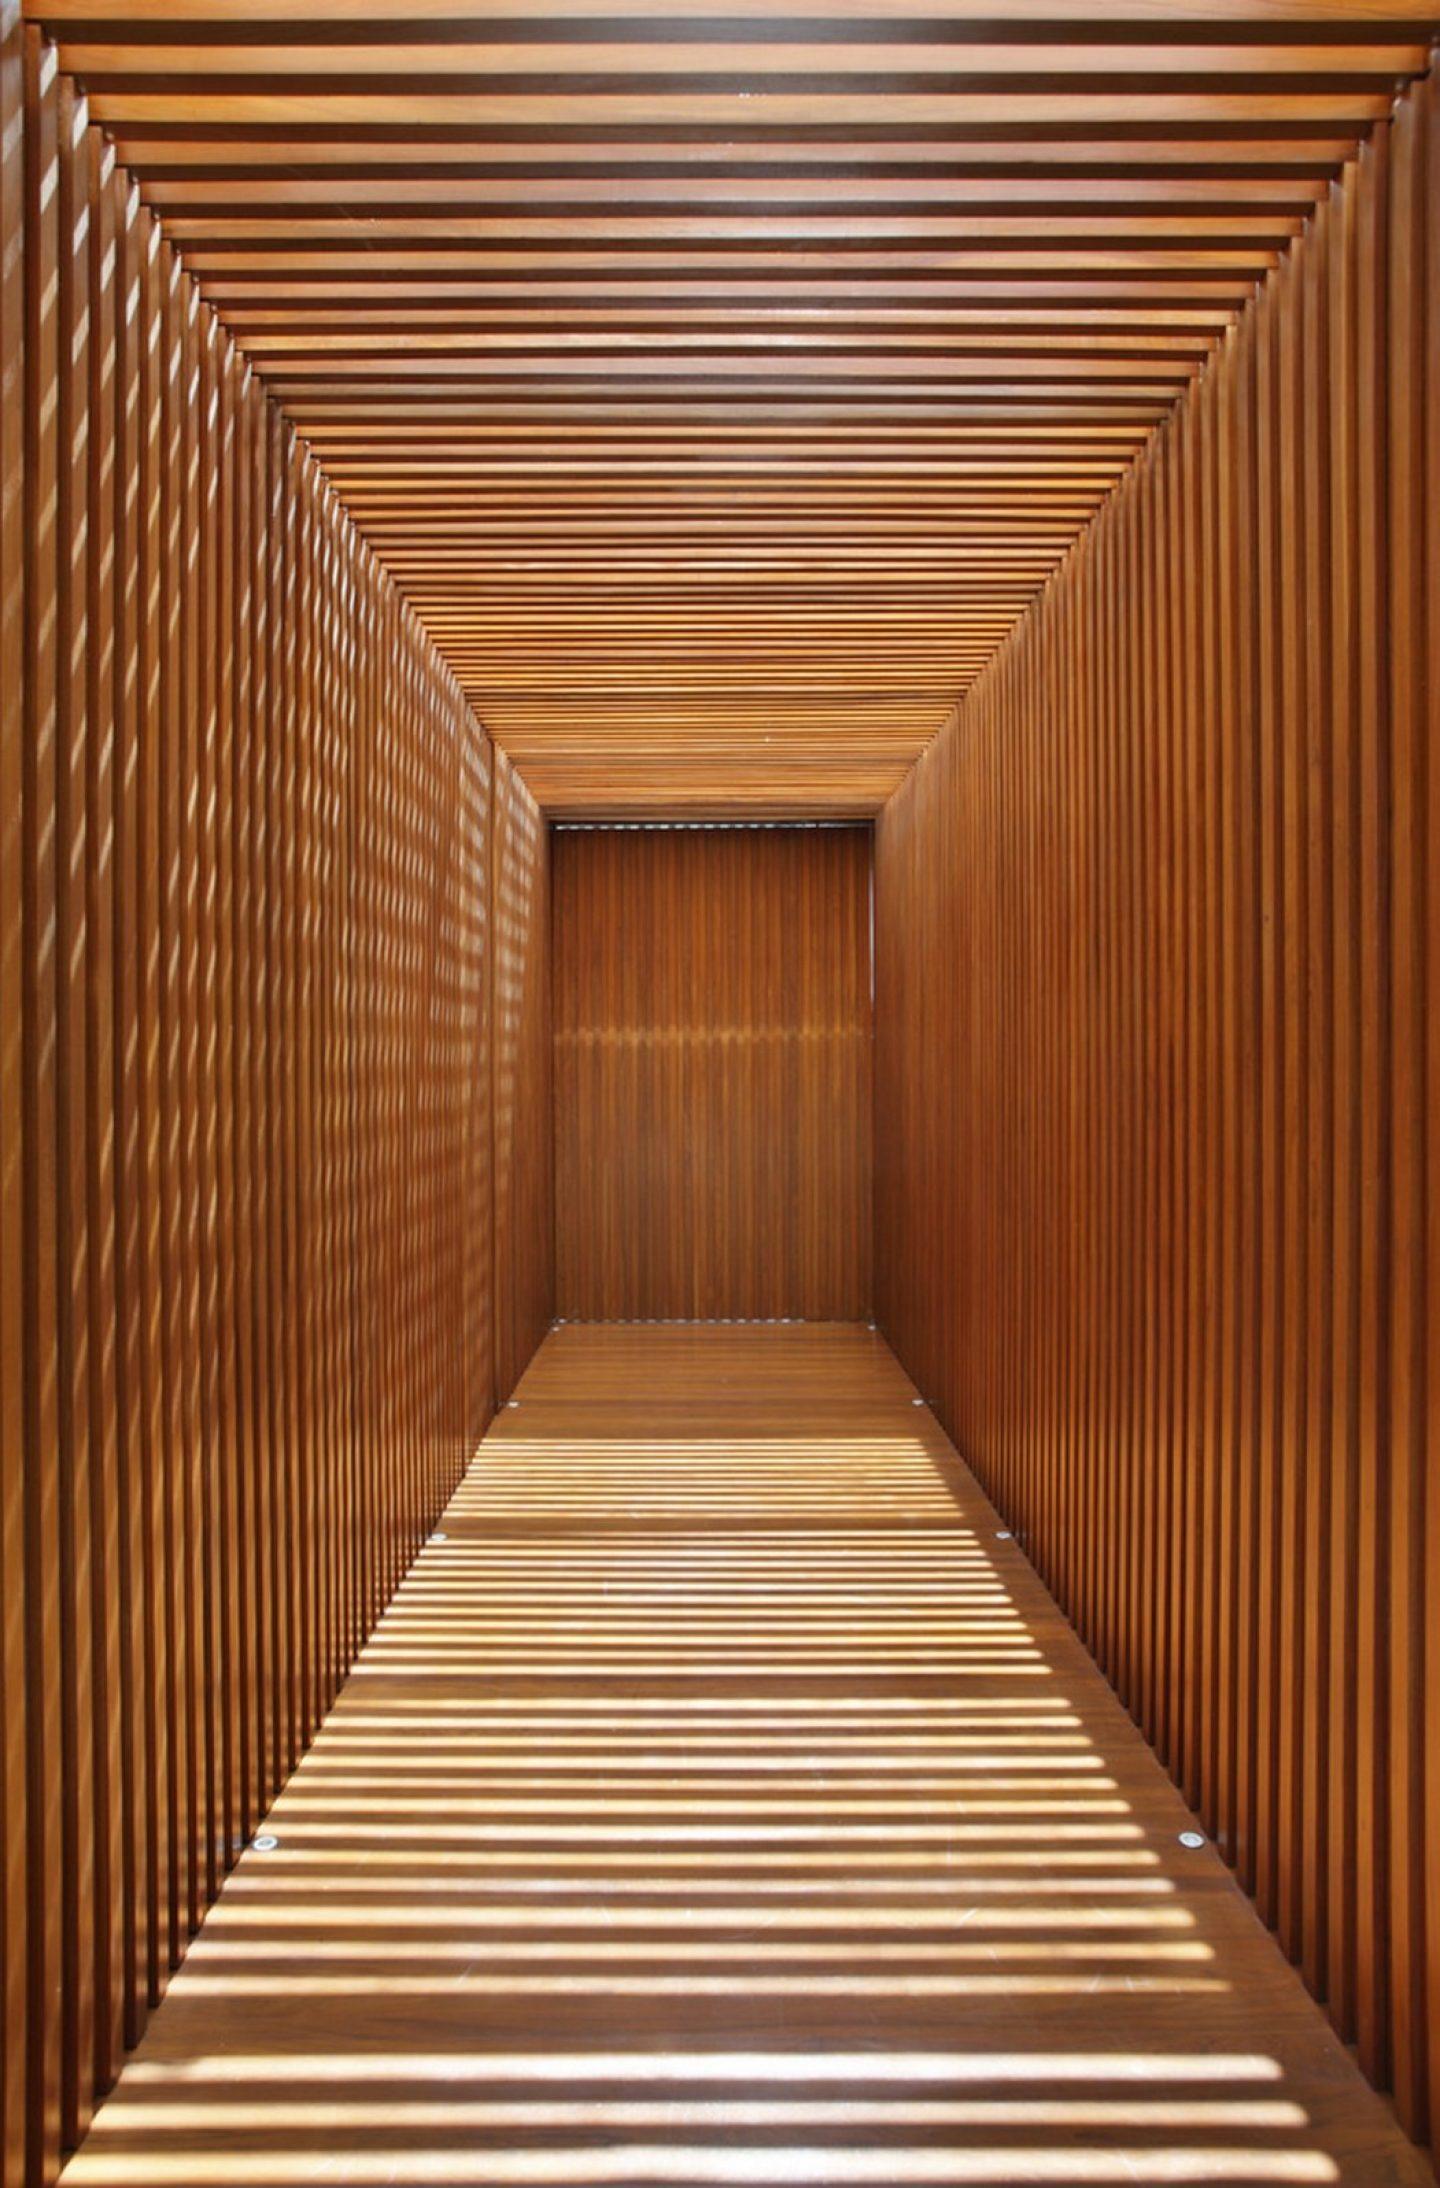 Guilherme_Torres_Architecture (3)